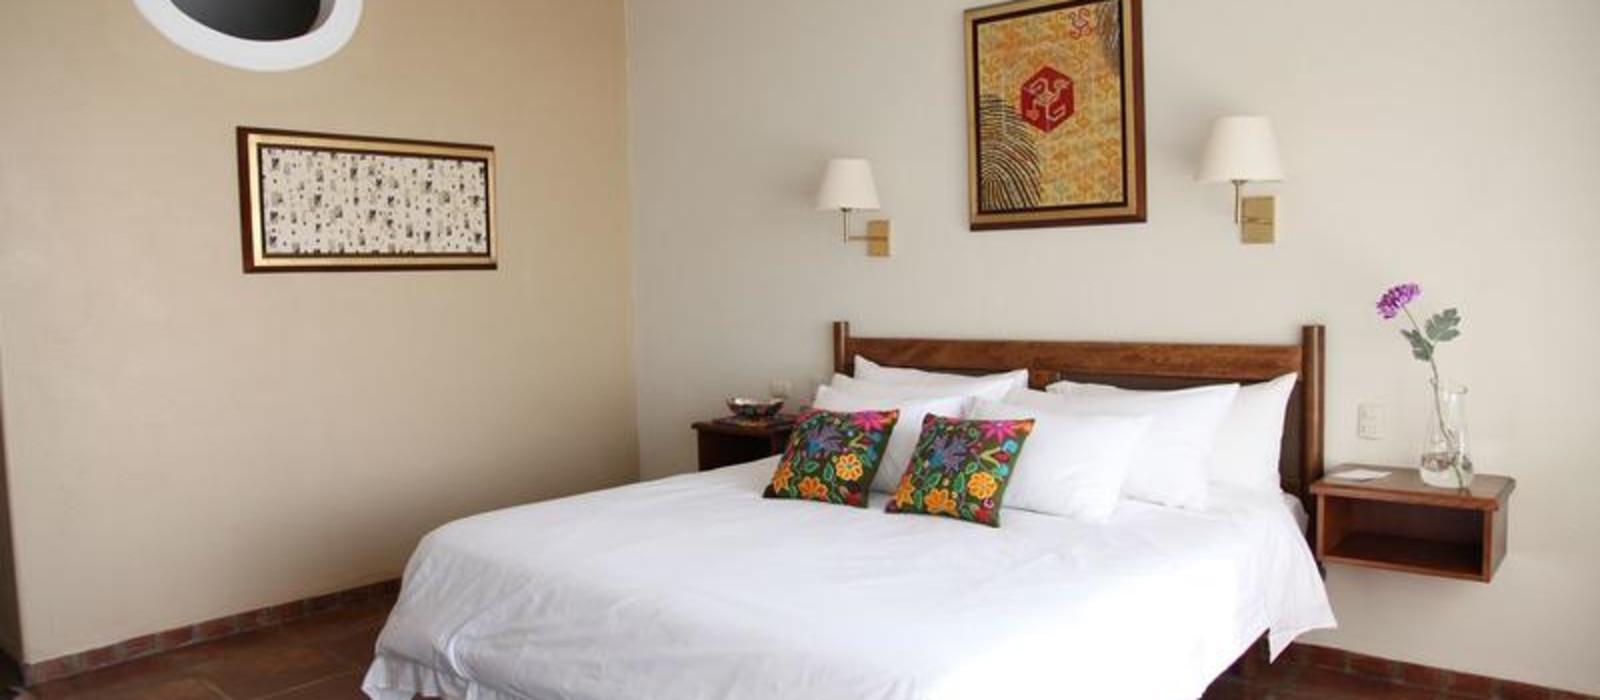 Hotel La Hacienda Bahia Paracas Peru